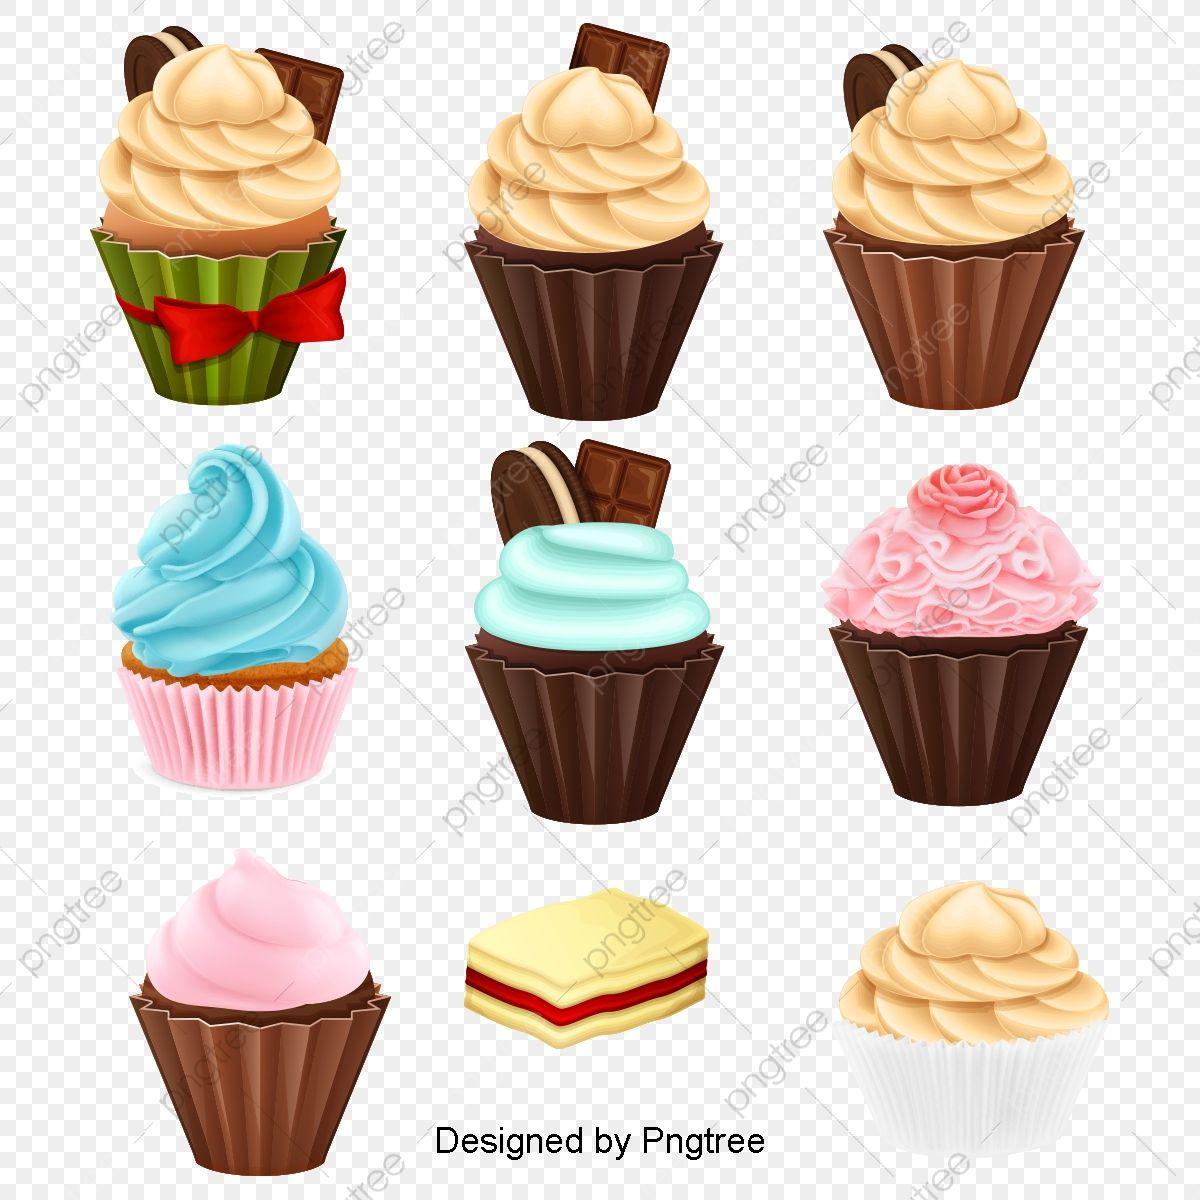 Vector Fruit Cupcake Cupcake Clipart Fruit Cupcakes Cup Cake Png Transparent Clipart Image And Psd File For Free Download Fruit Cupcakes Cupcake Clipart Cartoon Cupcakes